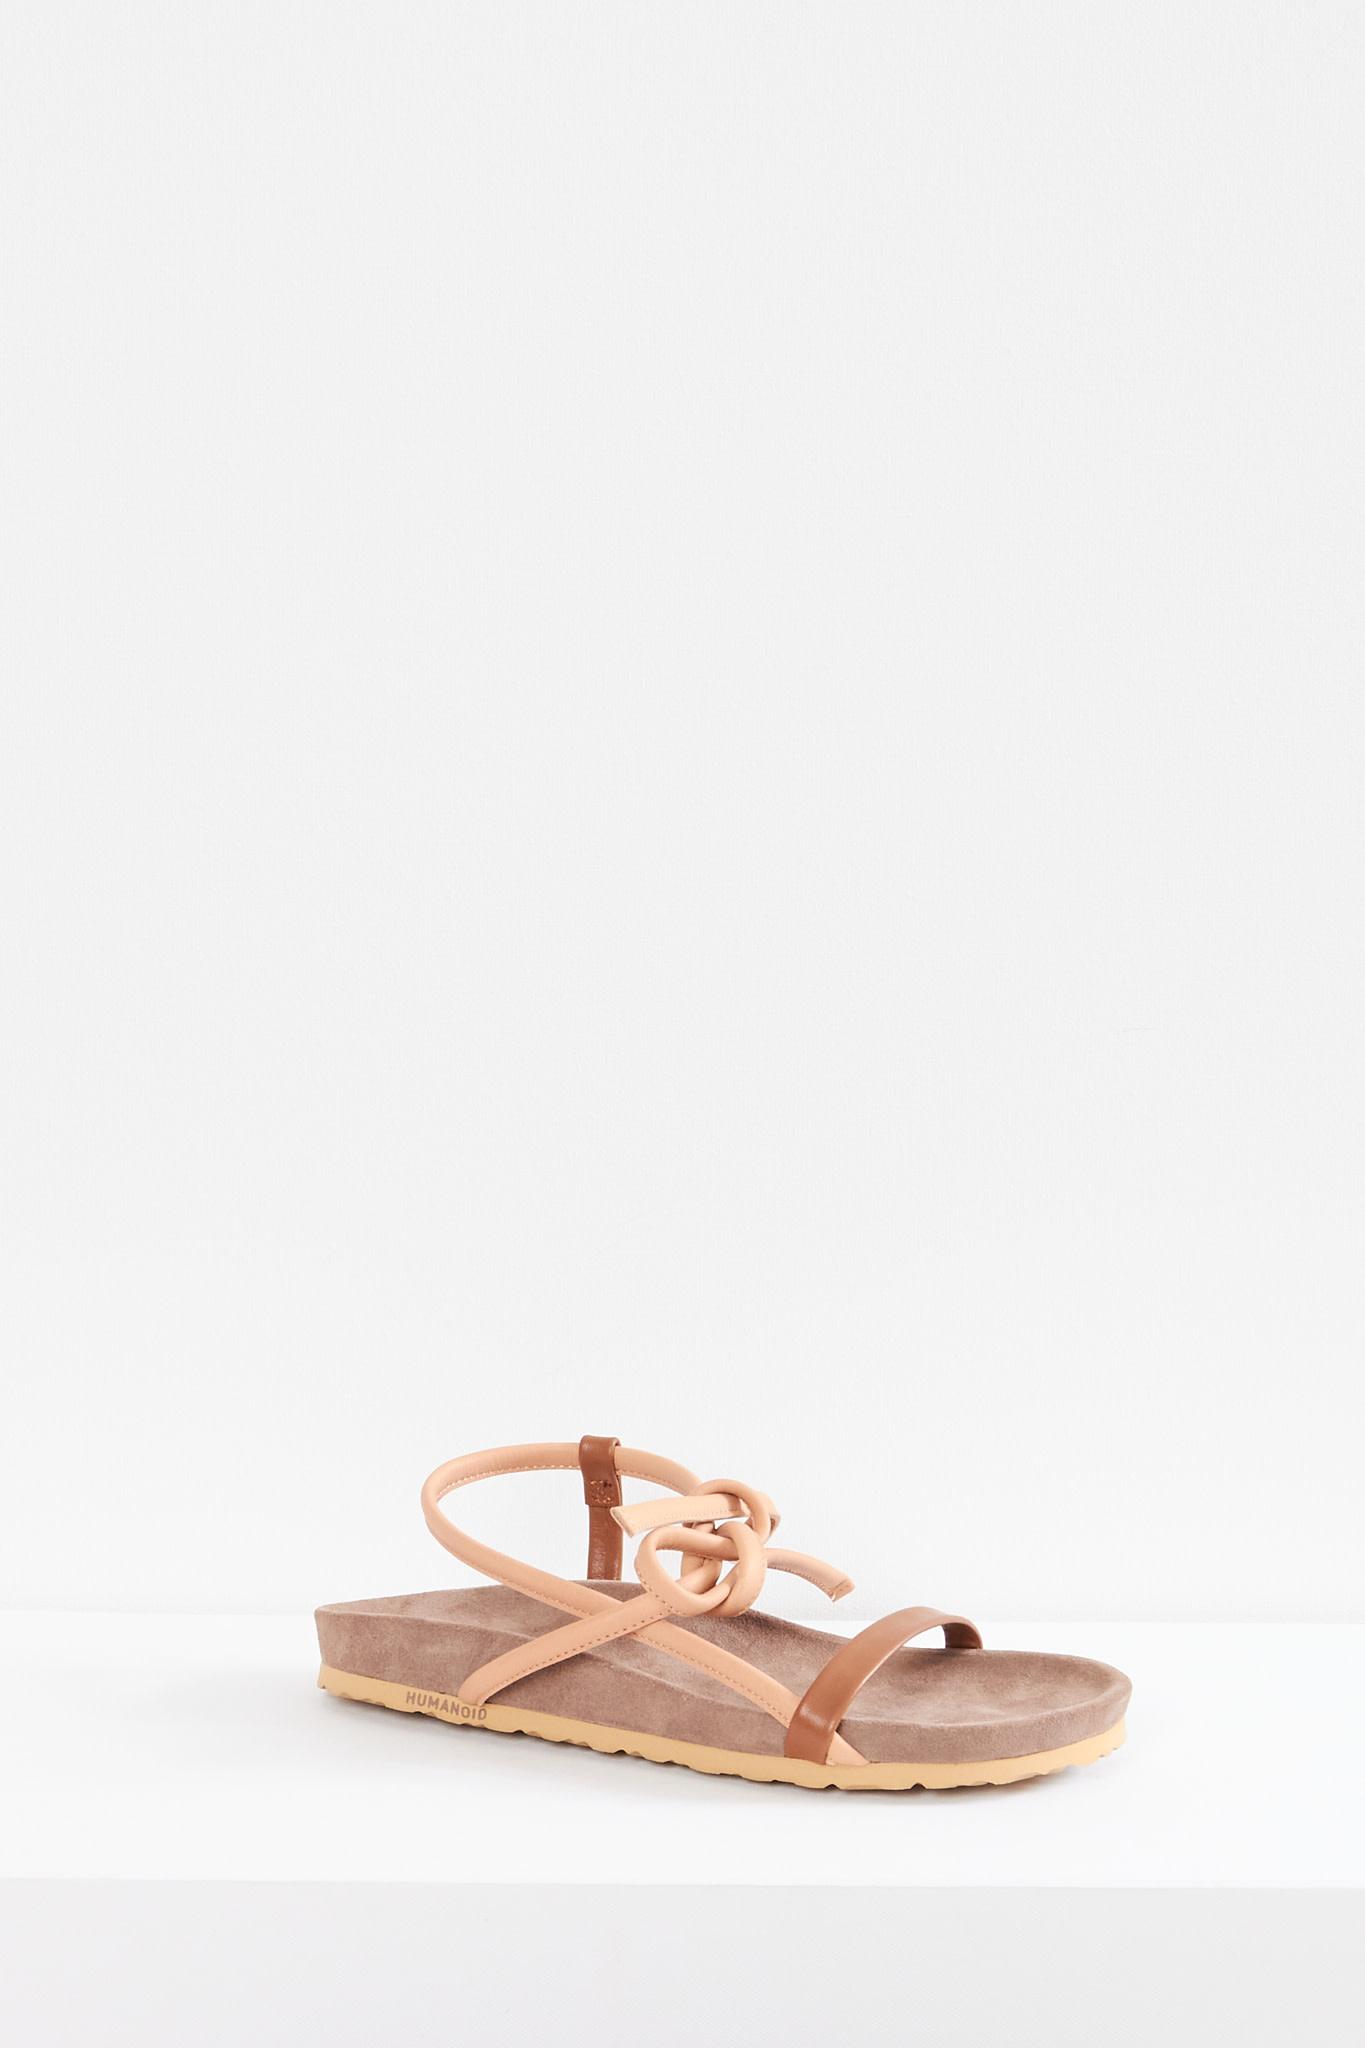 Humanoid - Selby slipper